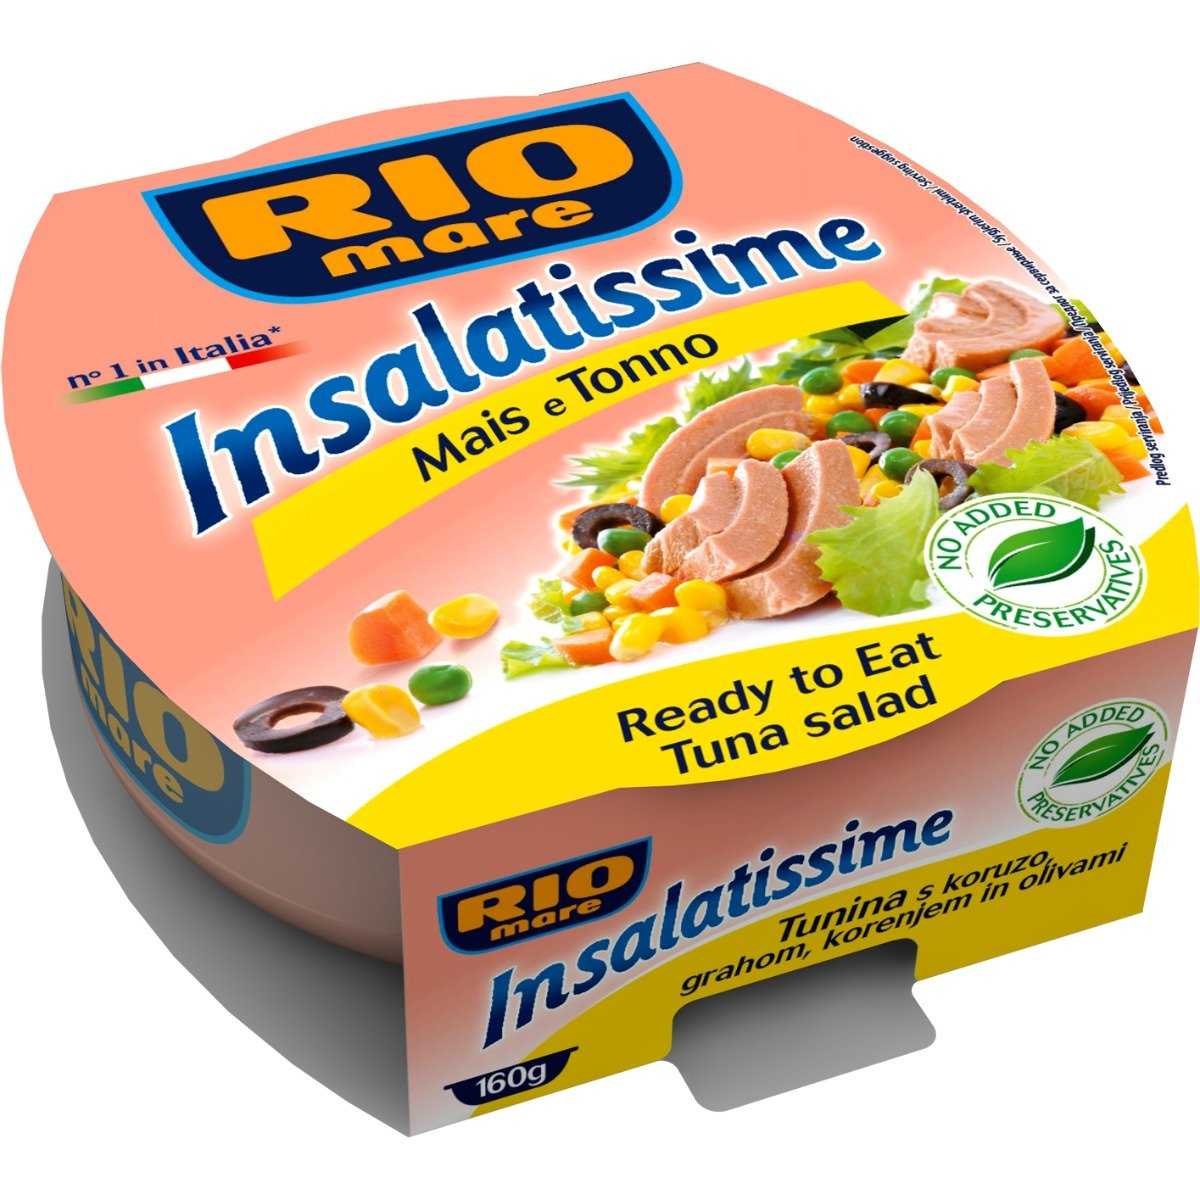 Salata de ton cu porumb Rio Mare, 160 g imagine